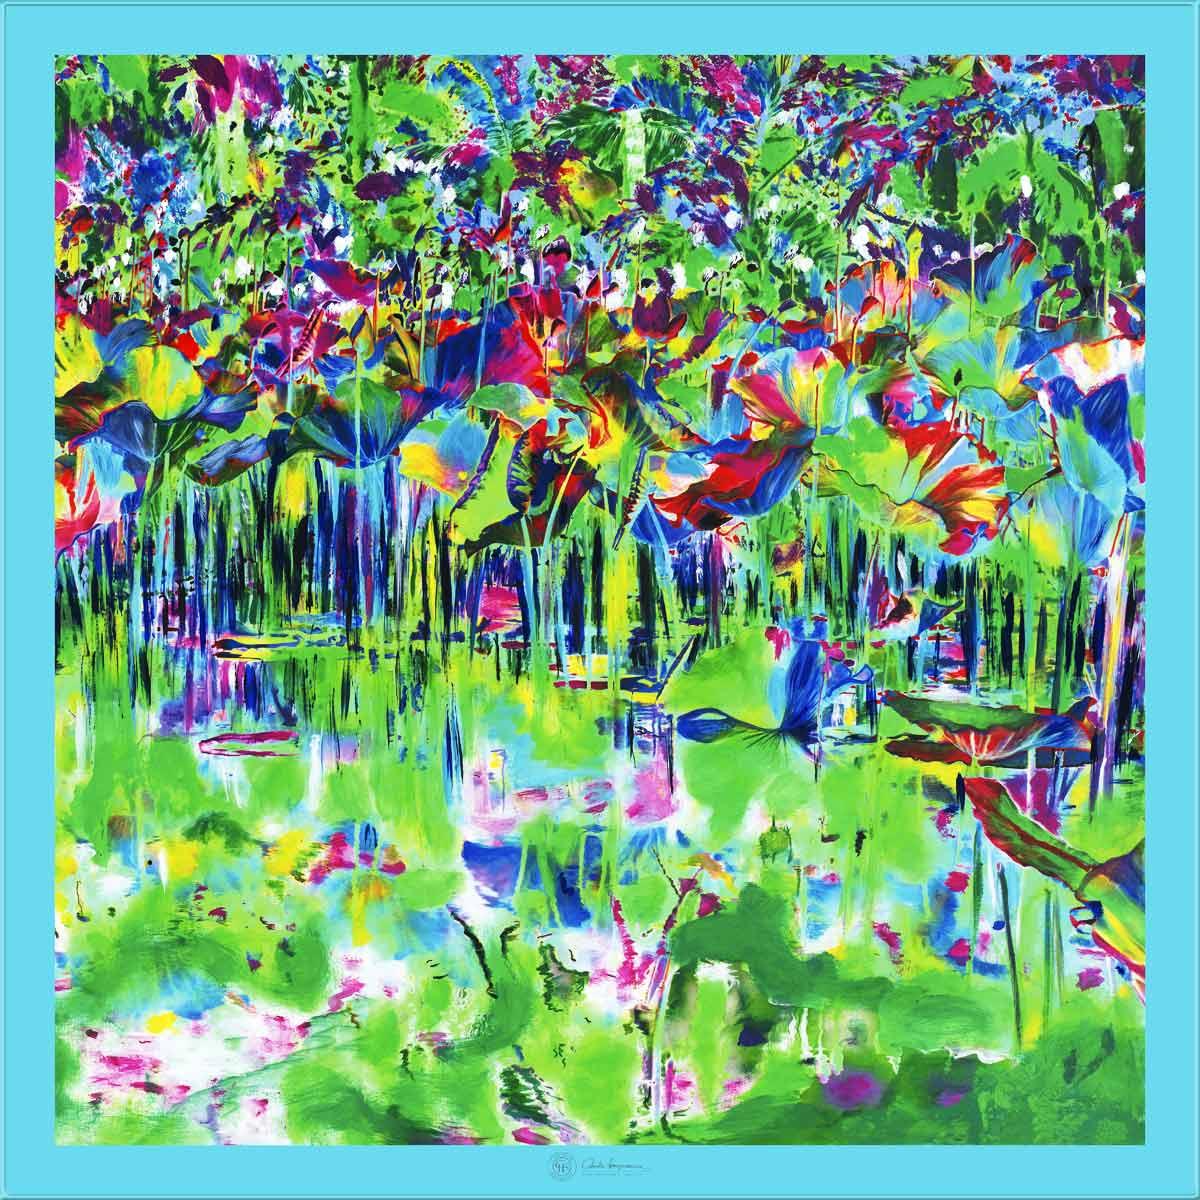 Cornelia Hagmann Contemporary Artist La Galleria Silk Scarf The Majesty of Colours Blue, Seidenschal, sciarpa di seta, foulard soie,